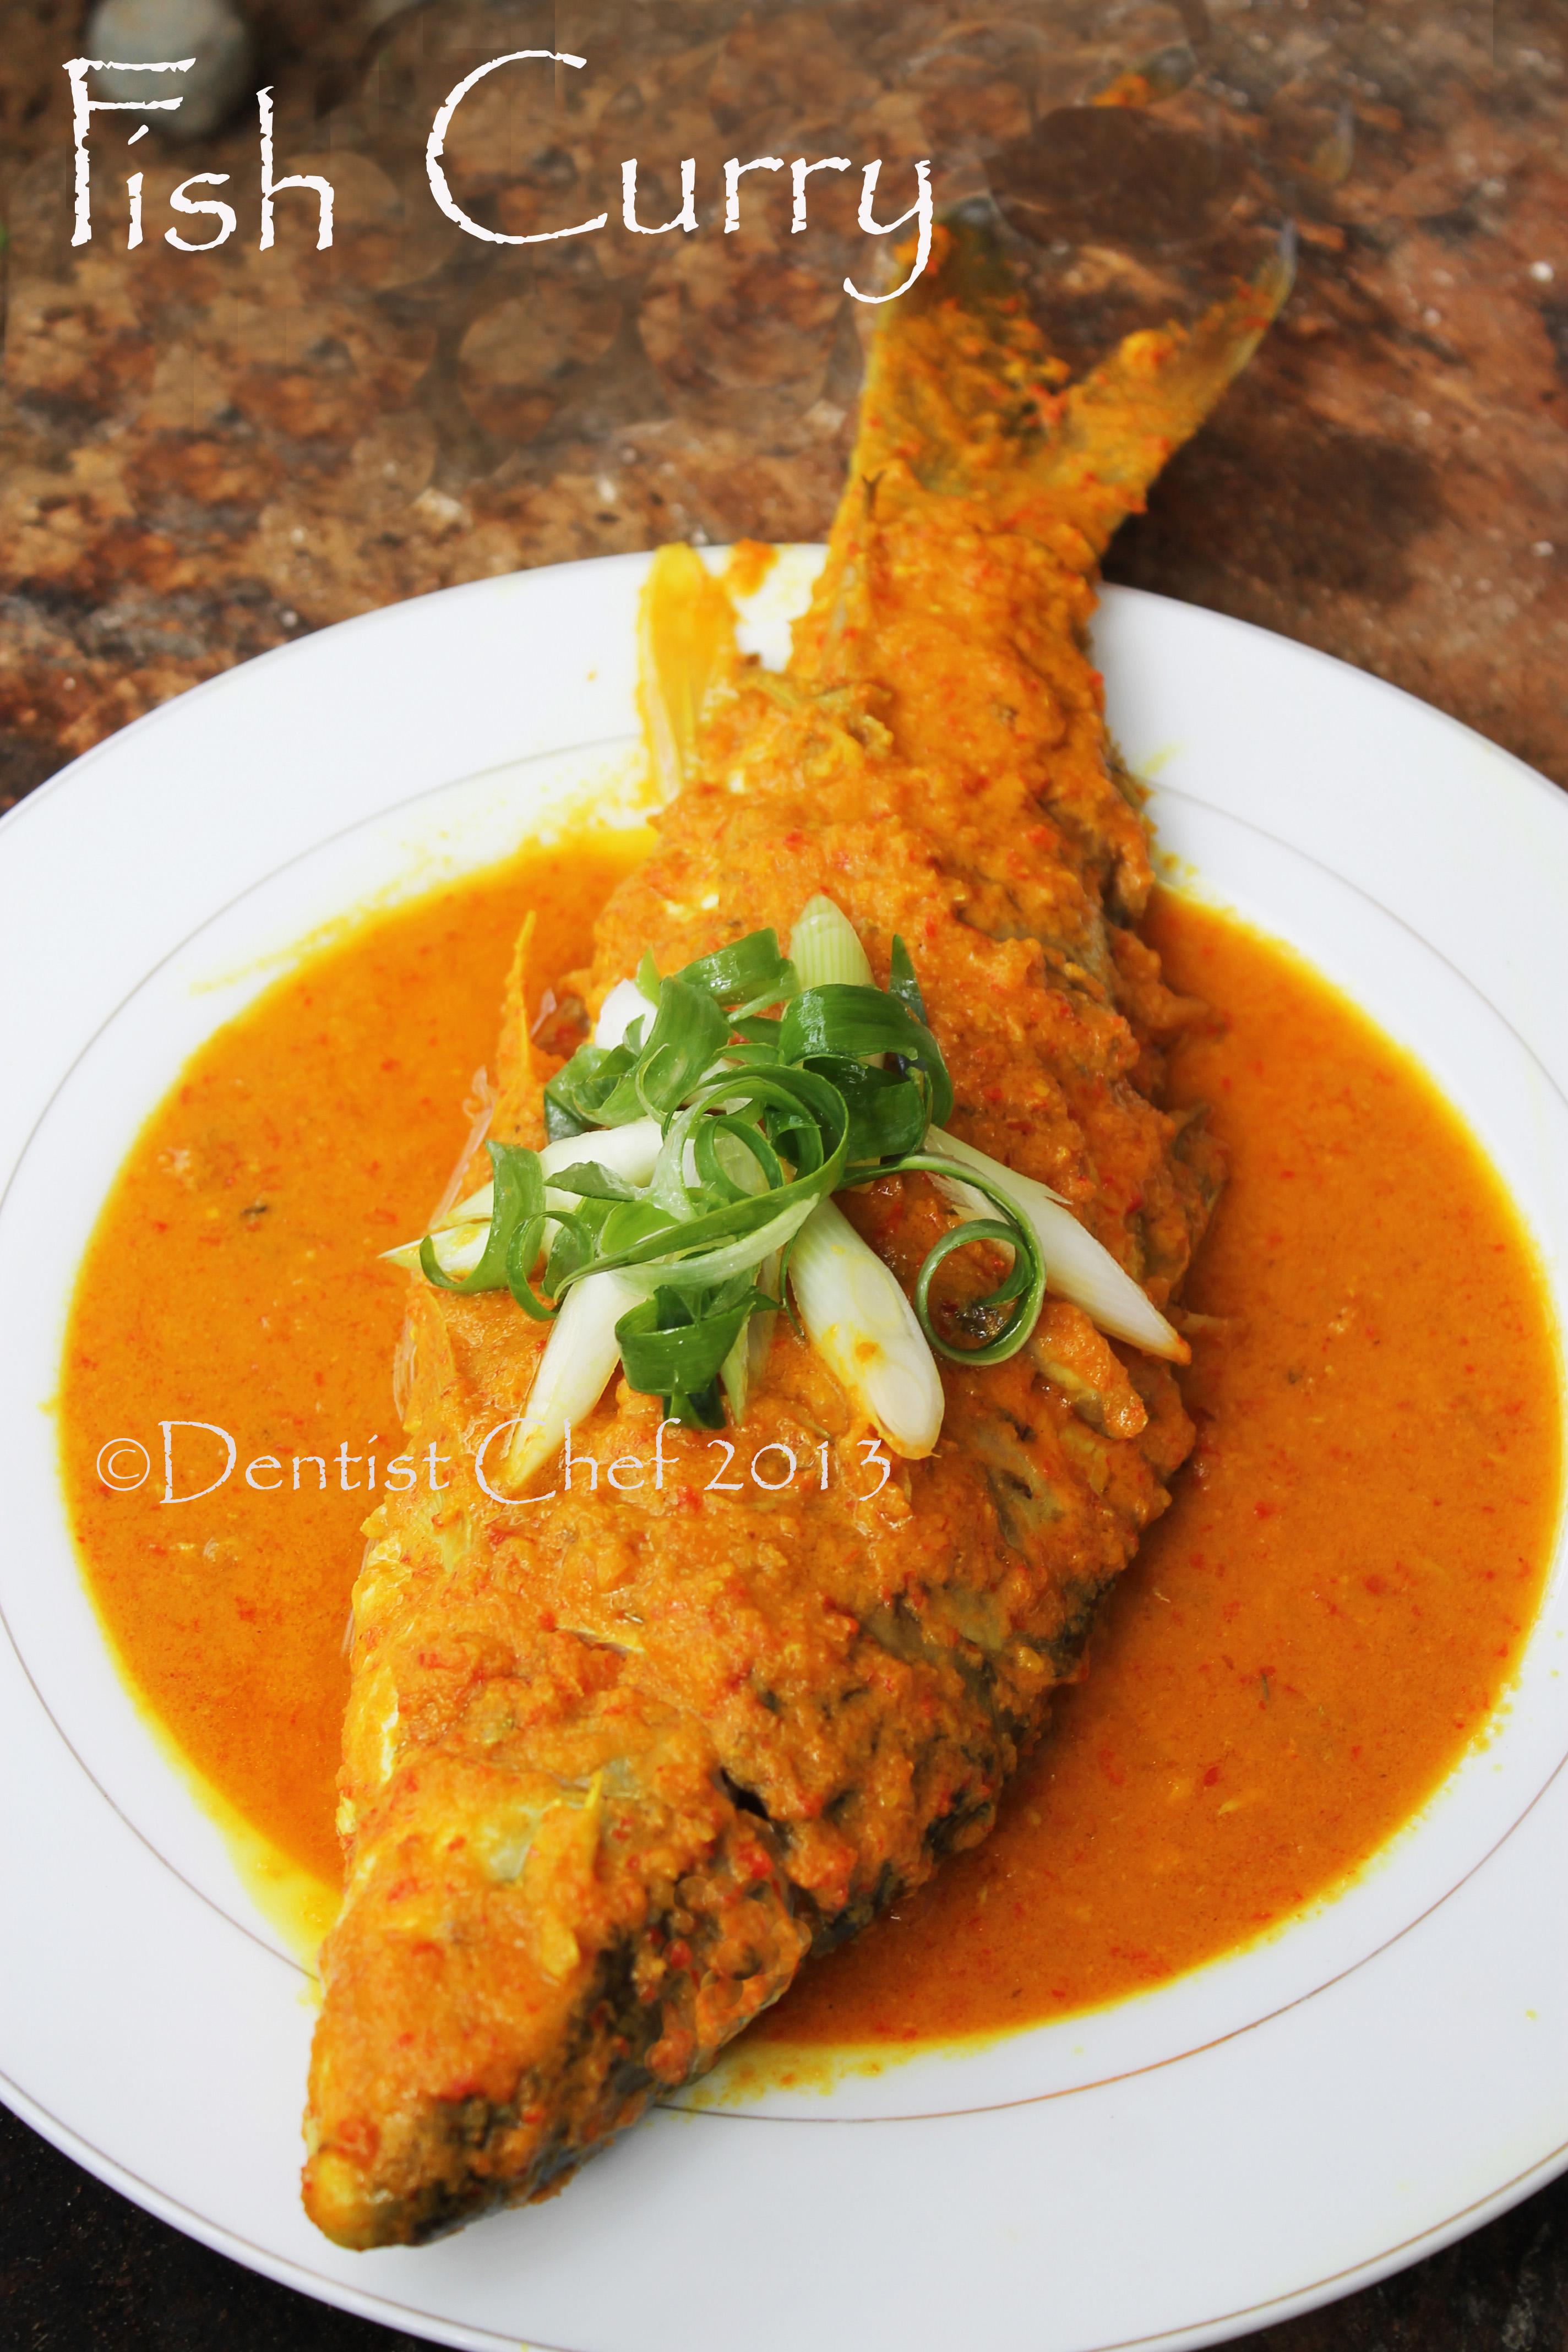 Resep Masakan Gulai Ikan Mas : resep, masakan, gulai, Masakan, Gulai, DENTIST